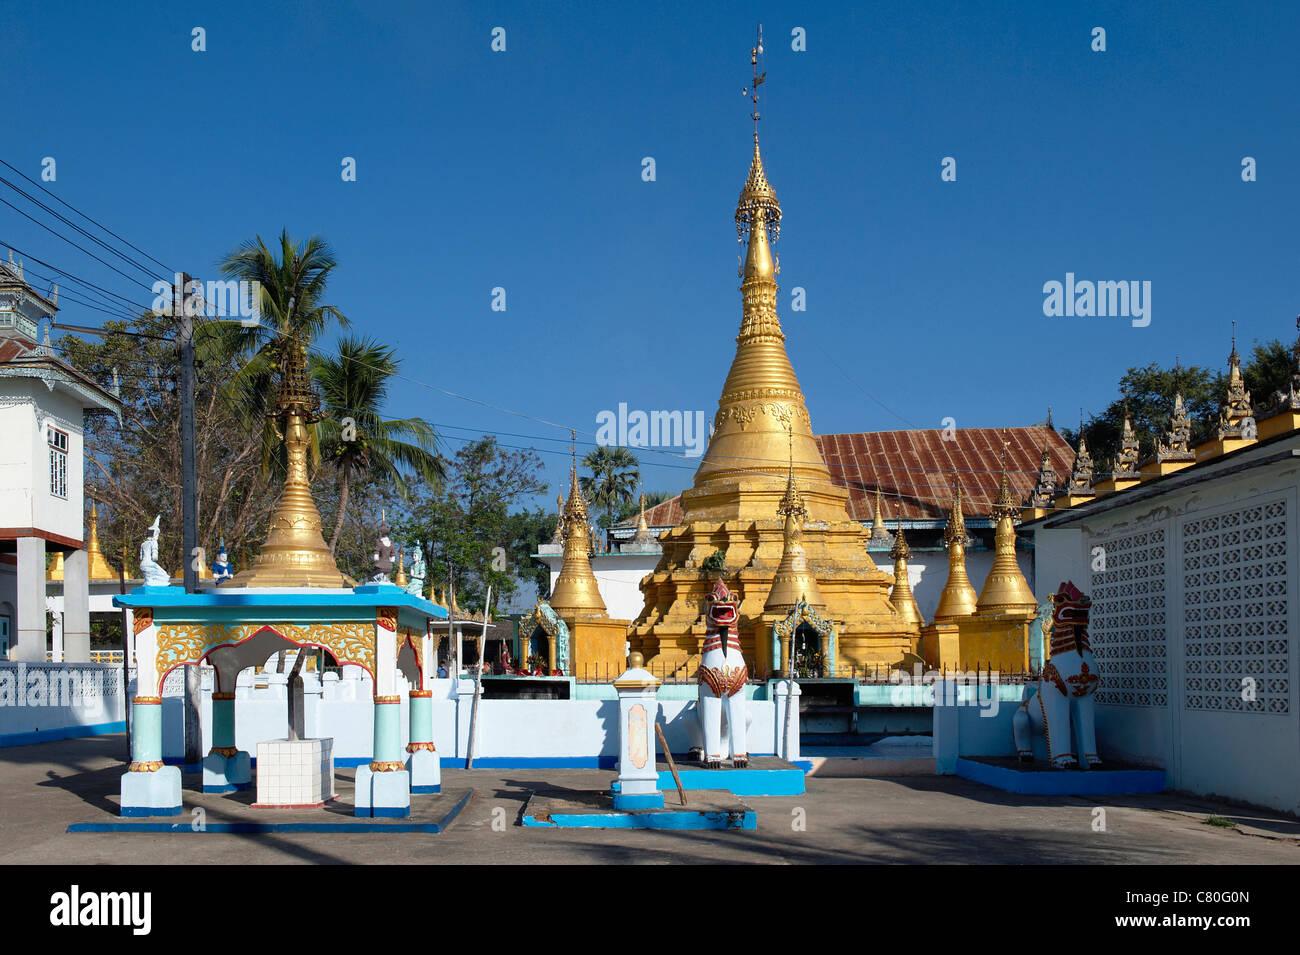 Thailand, Mae Sot, buddhist temple - Stock Image